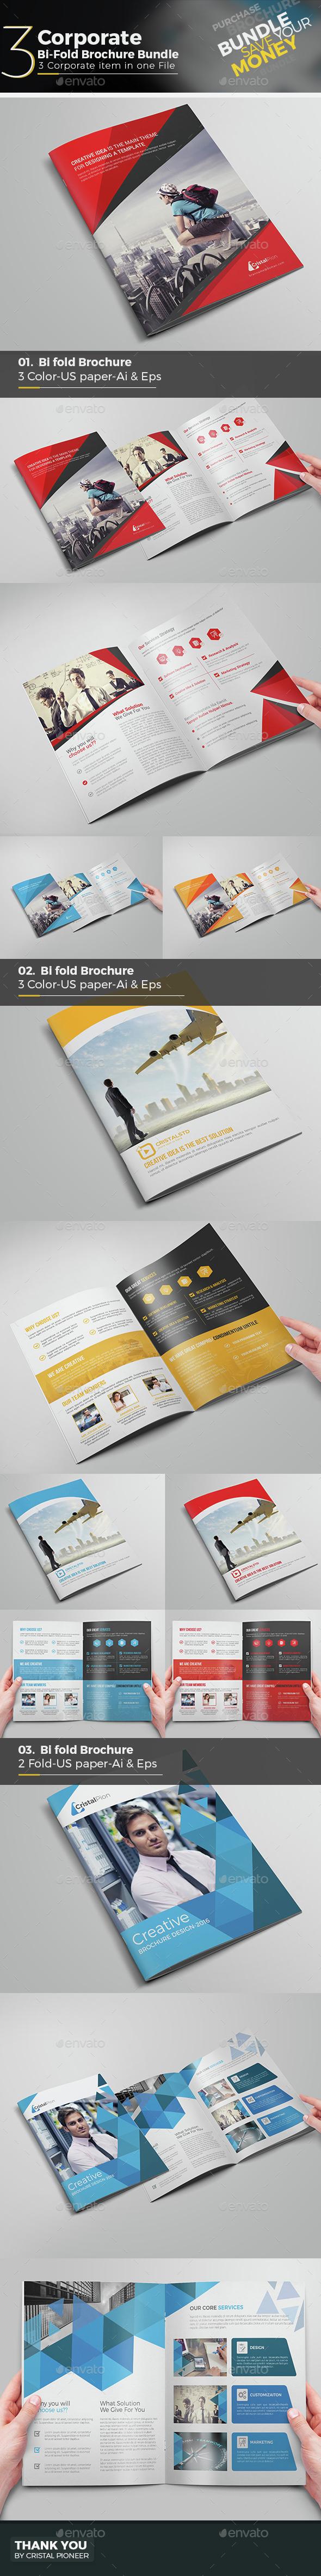 Bi Fold Brochure Bundle 3 in 1 - Corporate Brochures